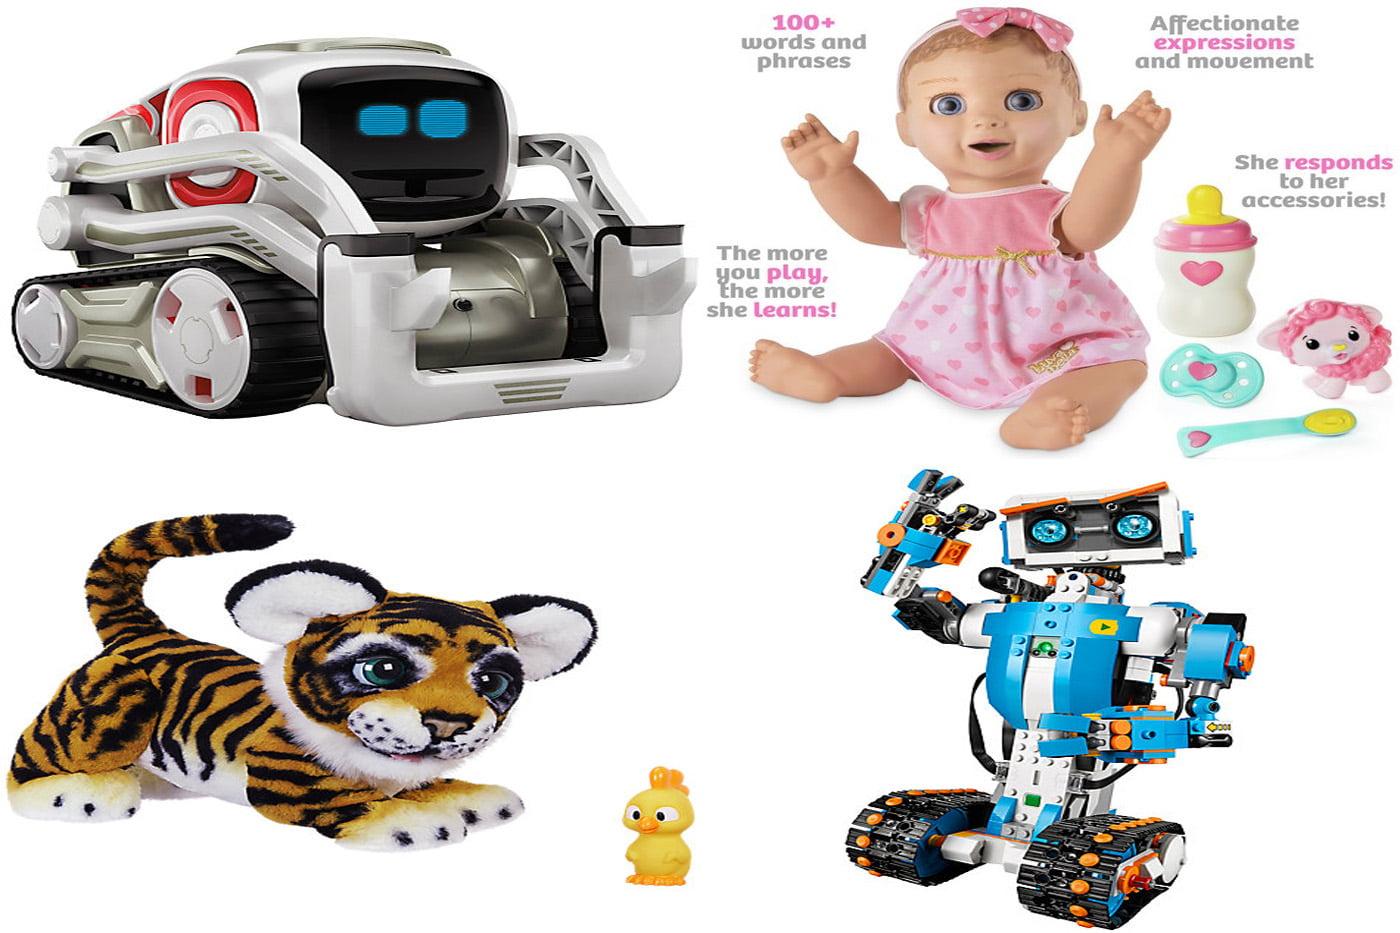 Vivre Le Rêve Christmas Toy Top Ten Predictions